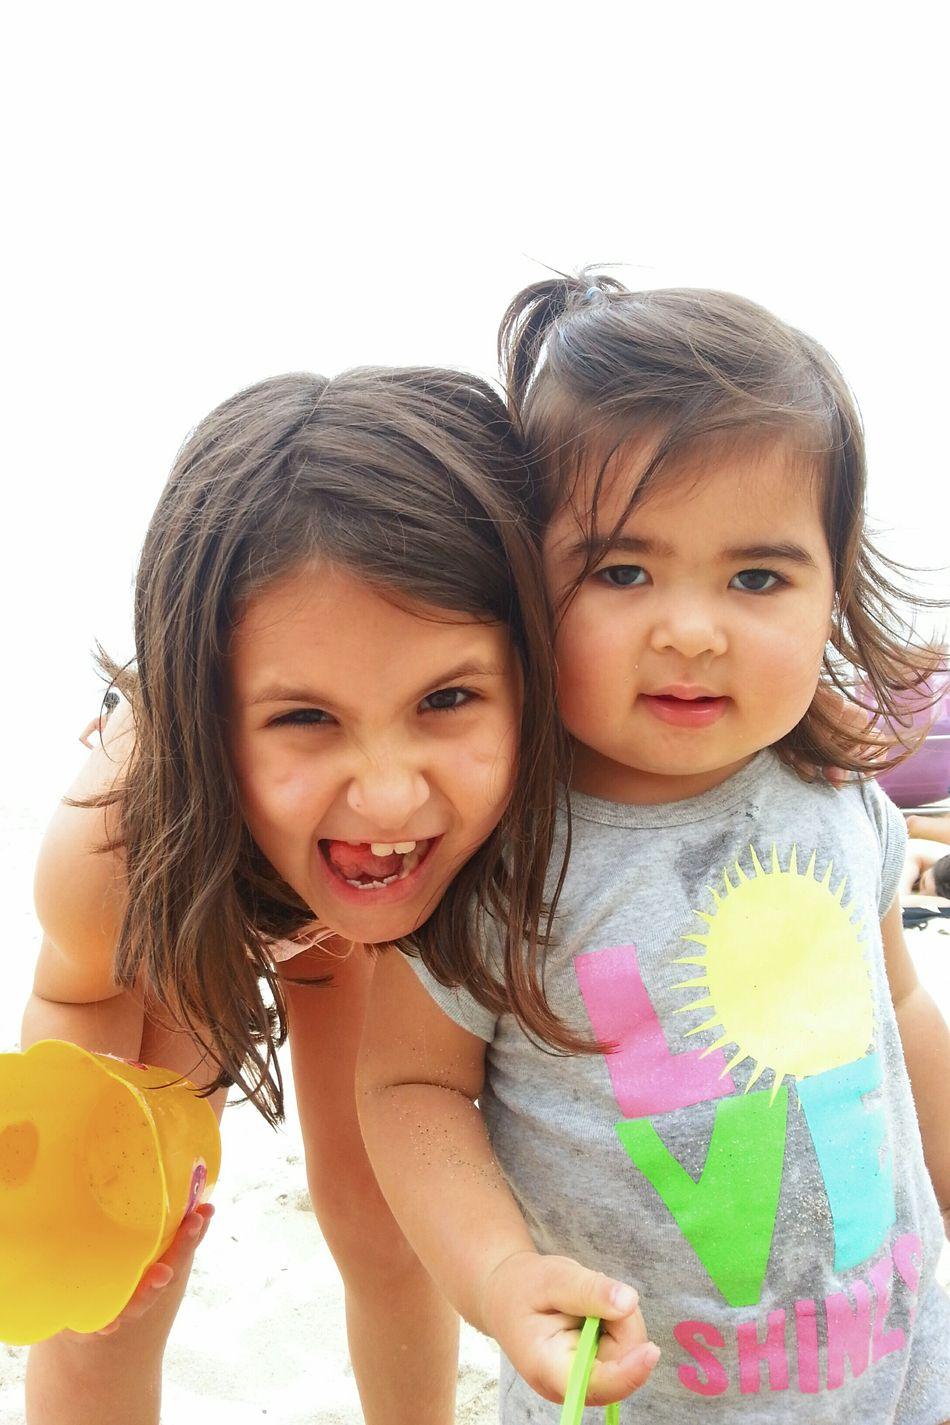 Beachphotography Childrenphoto Bigsmile